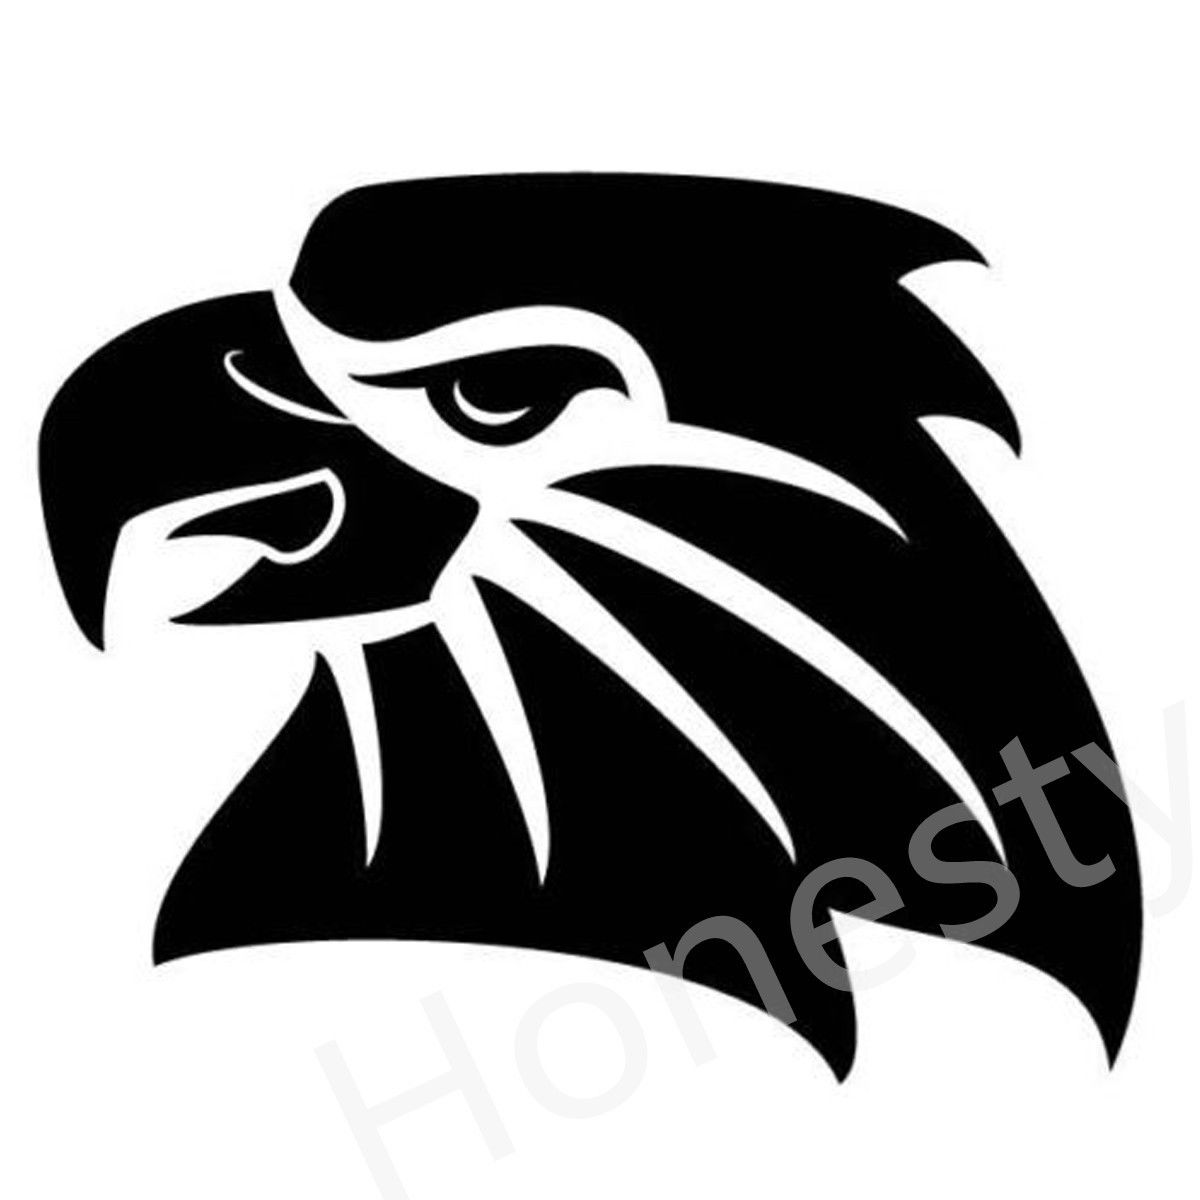 Car sticker eagle - Eagle Head Car Wall Home Glass Window Door Car Sticker Auto Car Truck Home Laptop Black